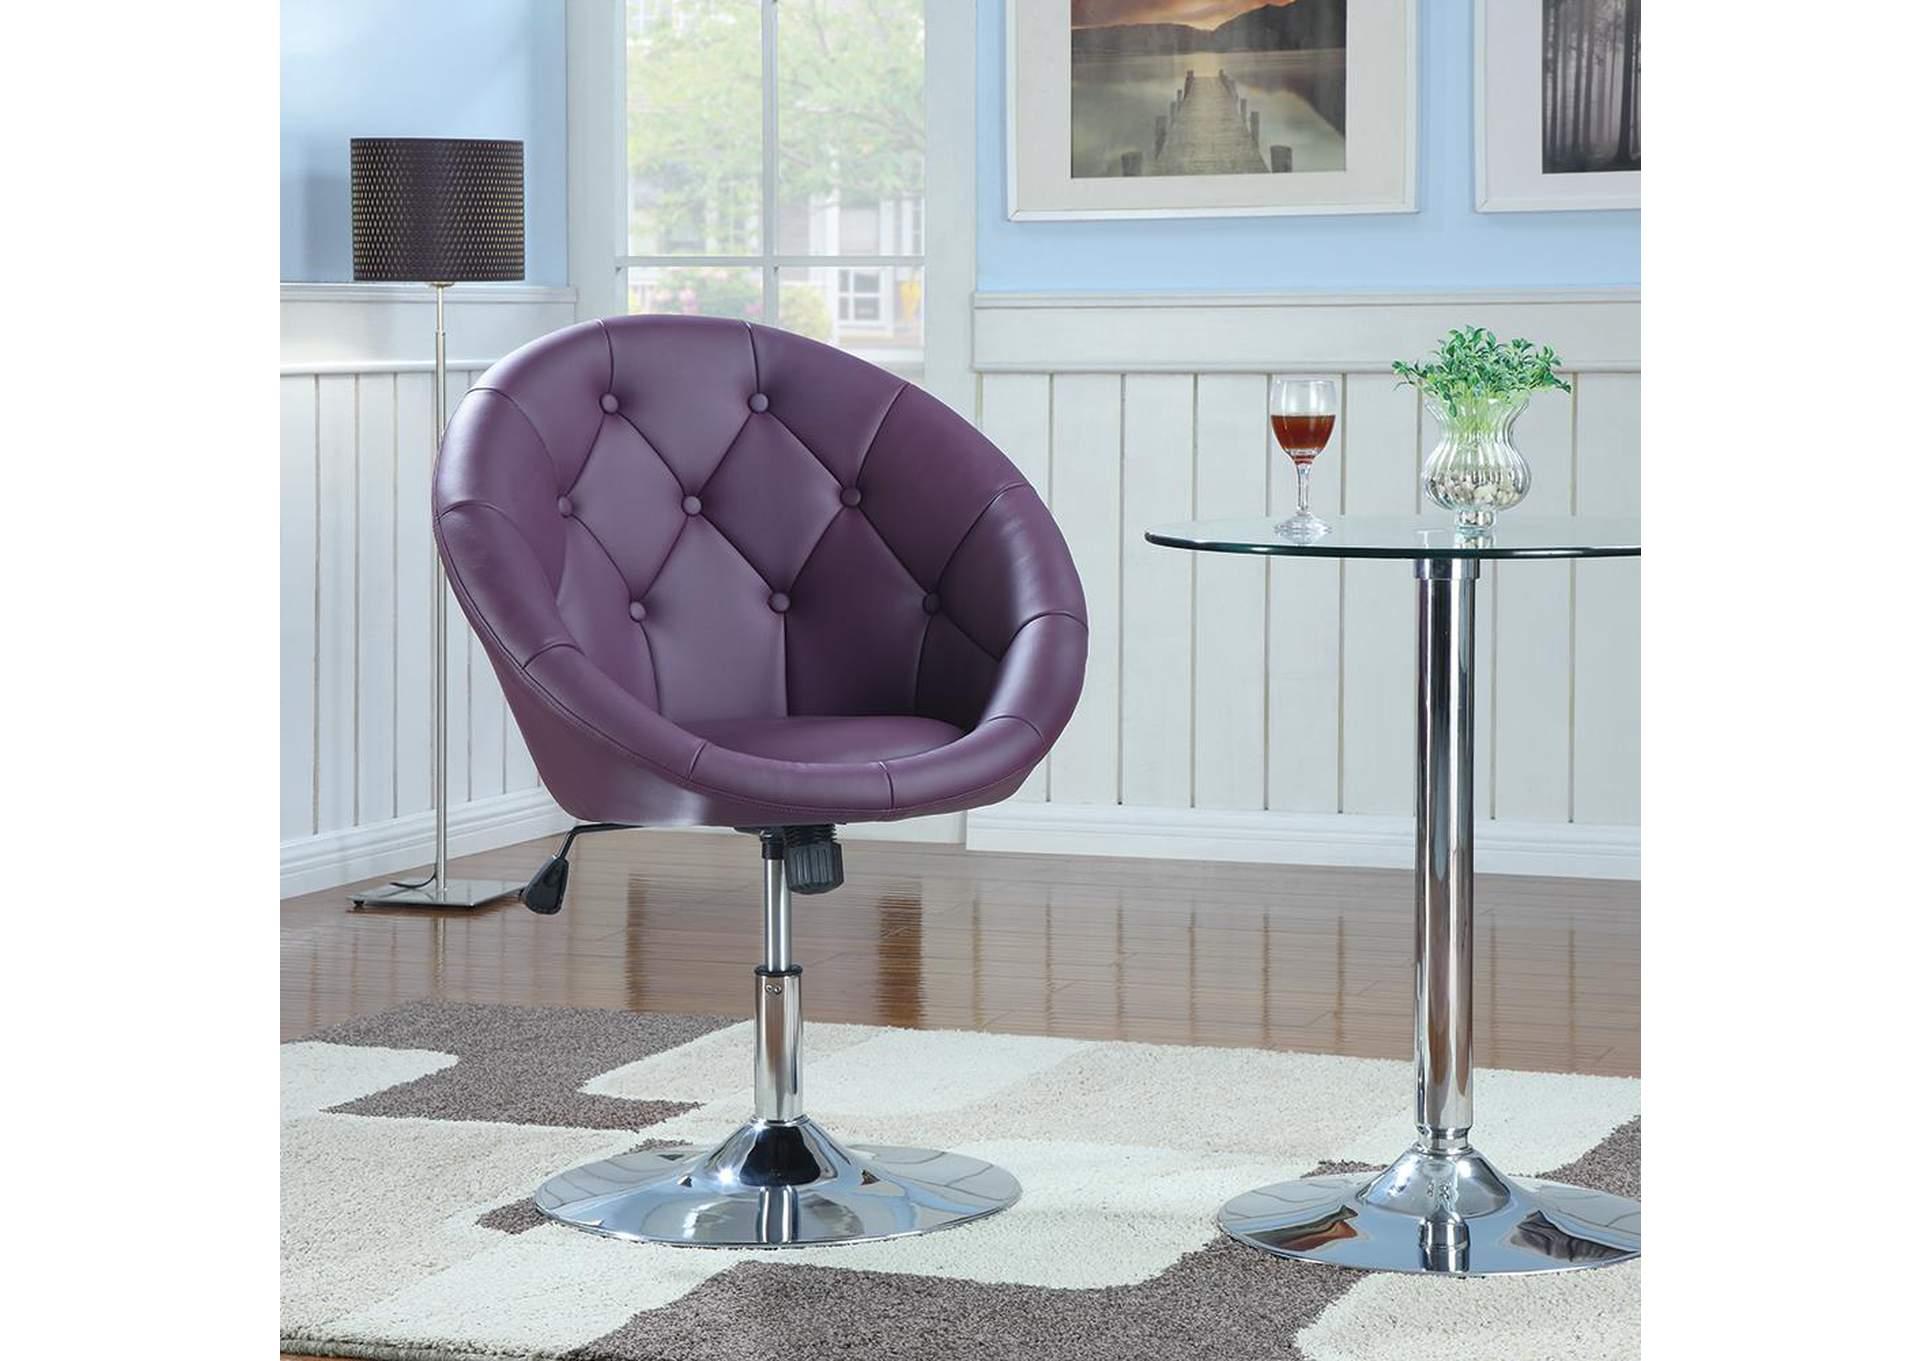 Merveilleux Pink/ Purple U0026 Chrome Swivel Chair,Coaster Furniture